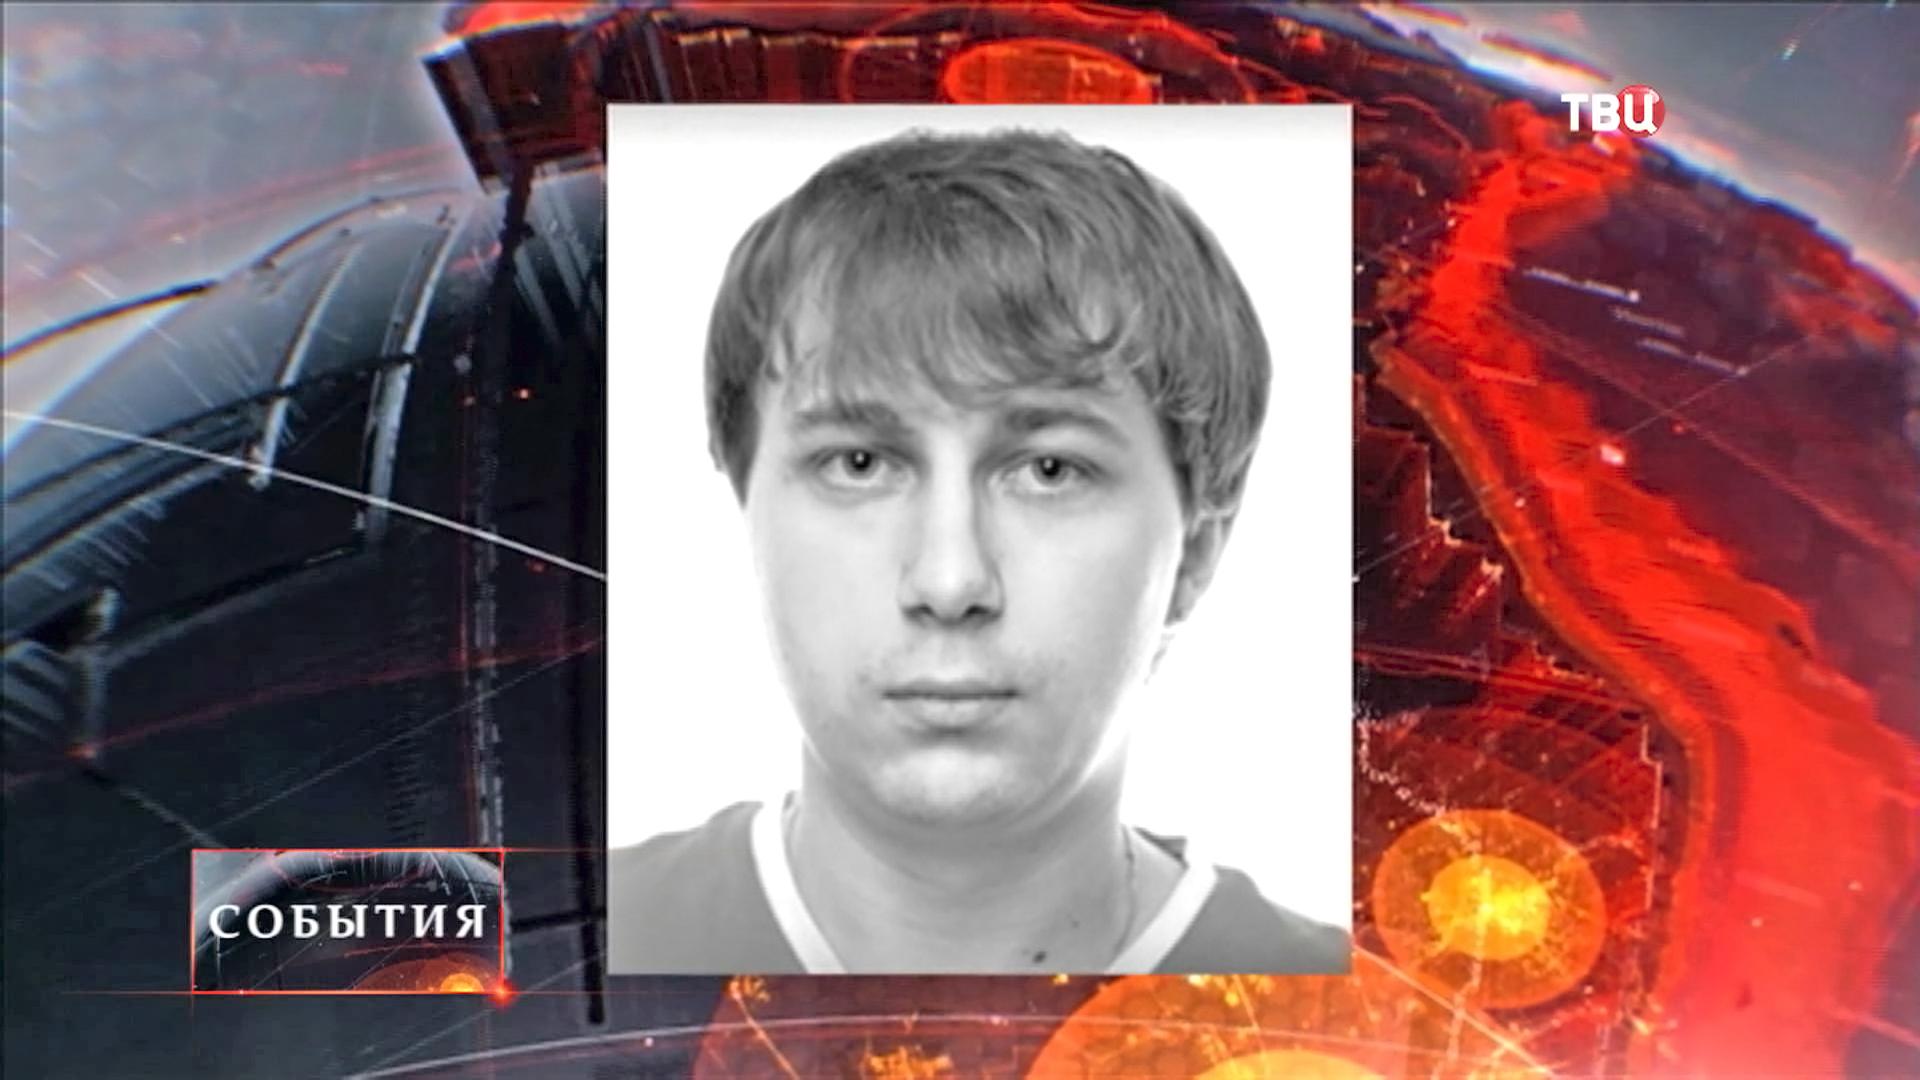 Звукоинженер Антон Волошин